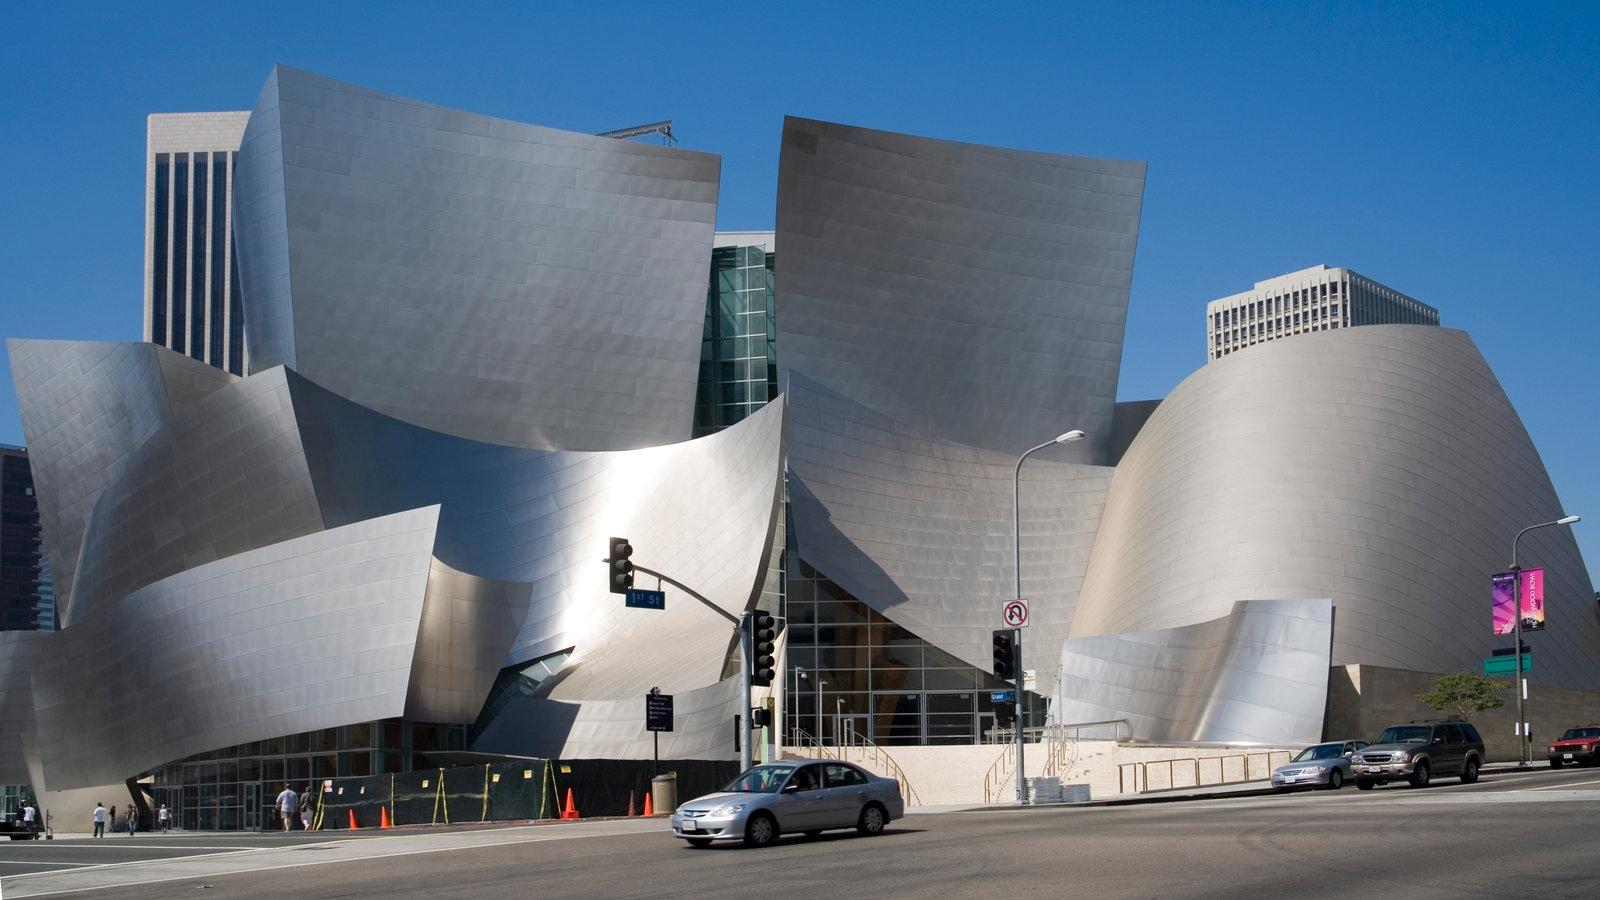 Los angeles architektur metropolen kultur planet wissen - Beruhmte architektur ...